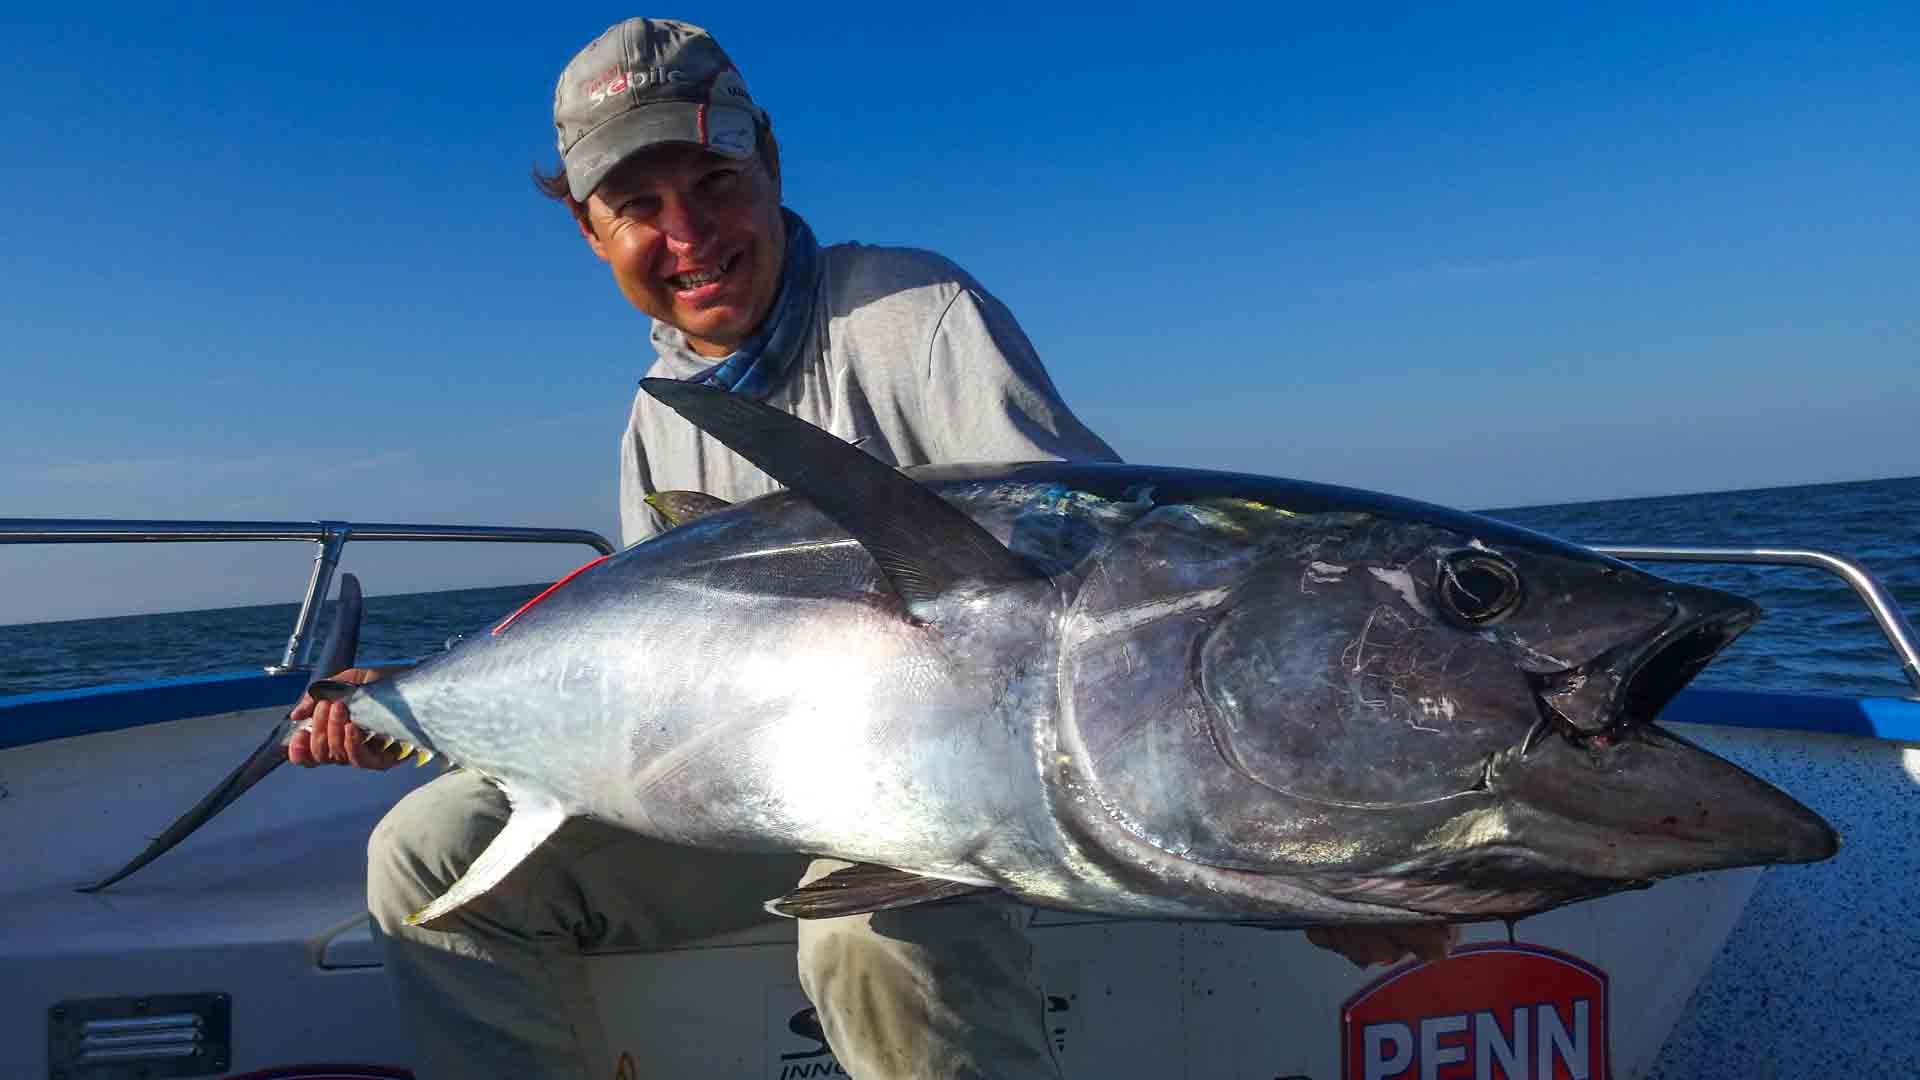 Attraper le carassin dor dans la pêche russe 3